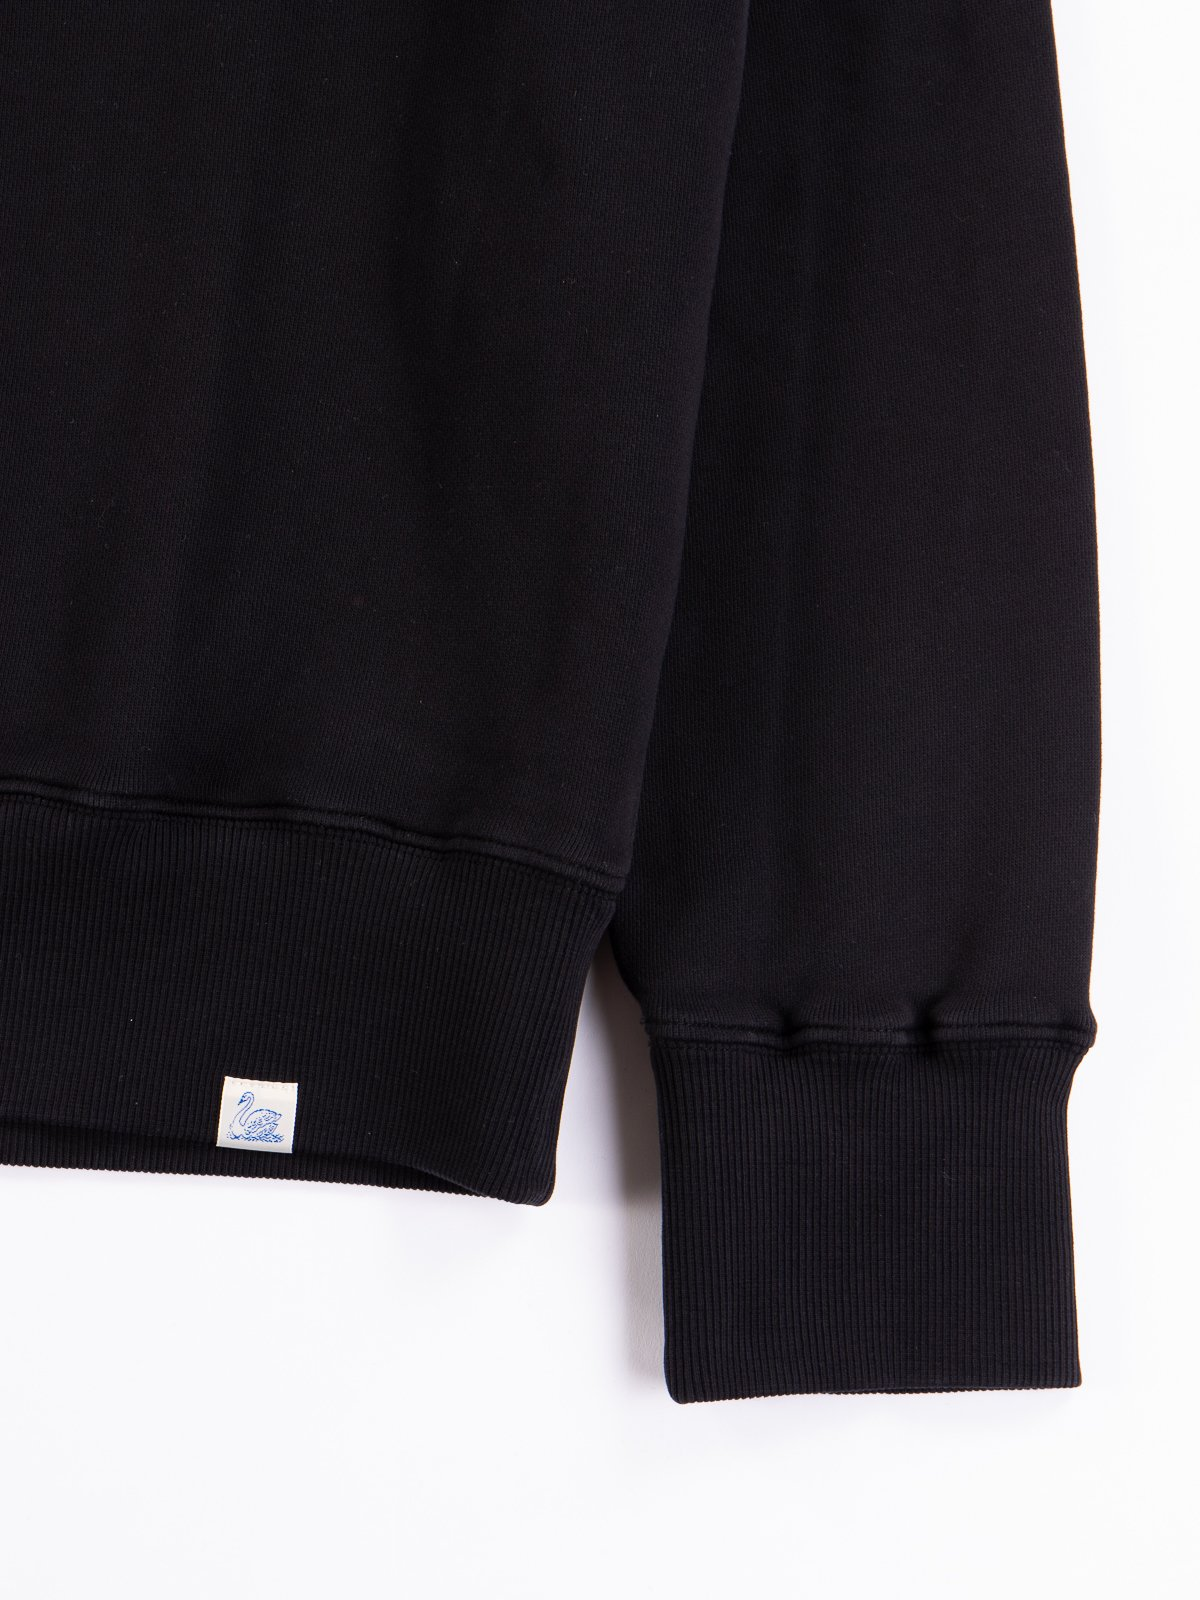 Deep Black Good Basics CSWOS01 Oversized Crew Neck Sweater - Image 4